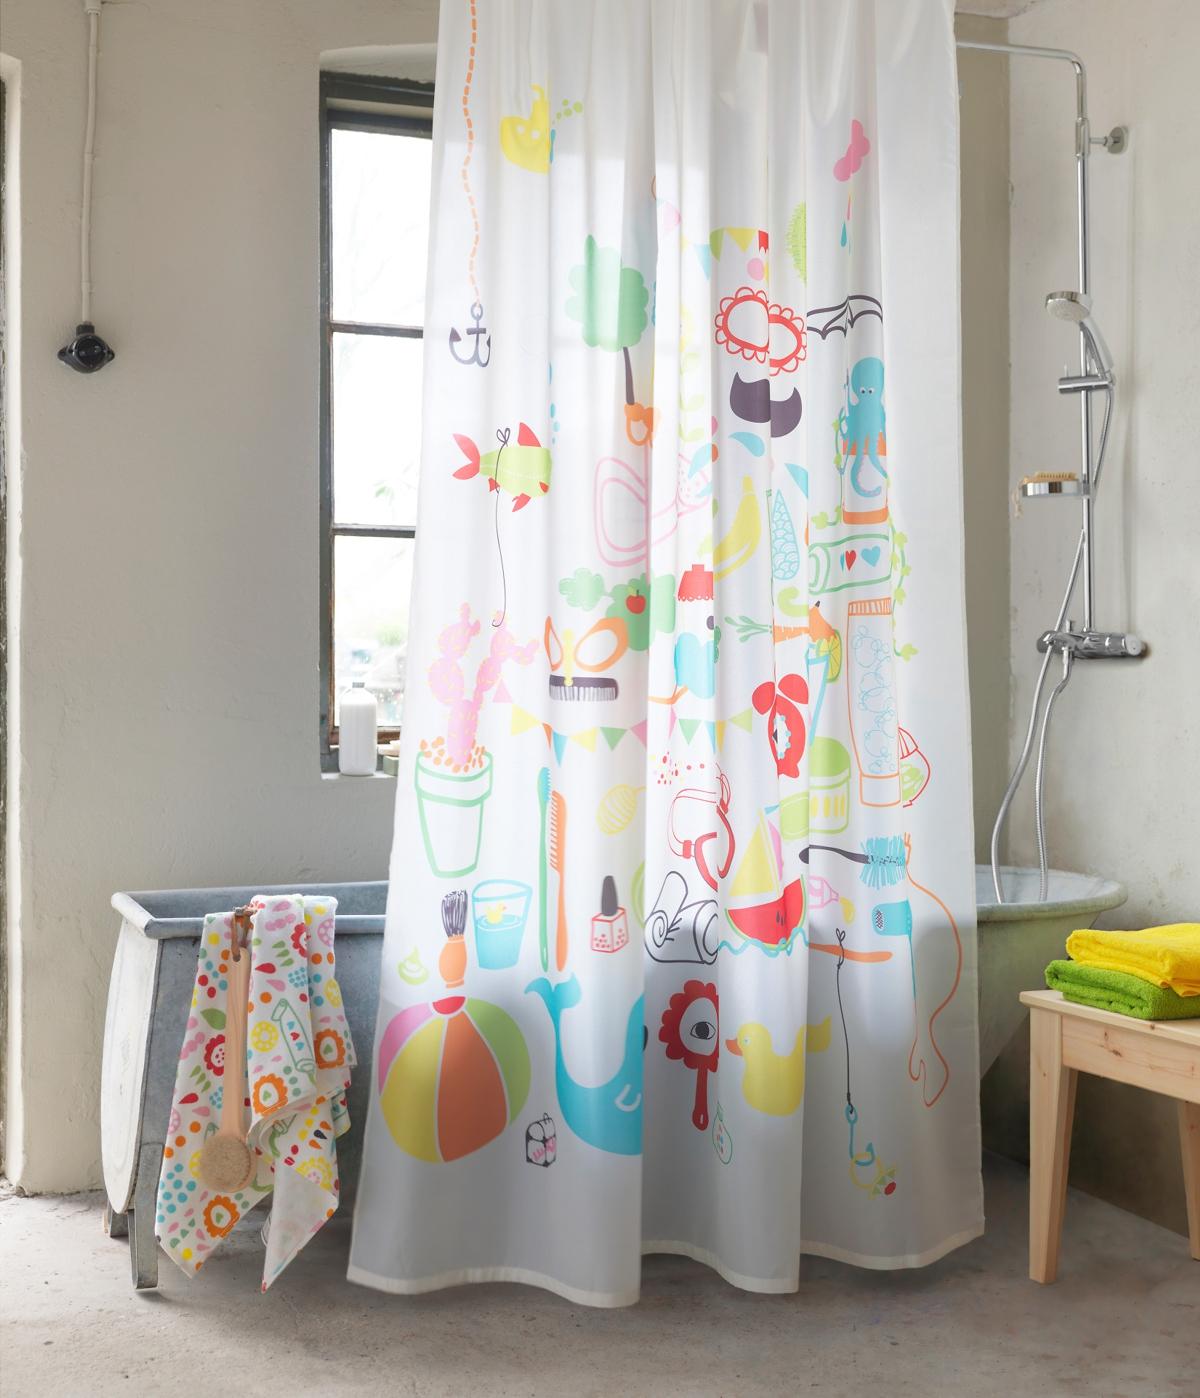 cortinas de baño ikea - en bañera